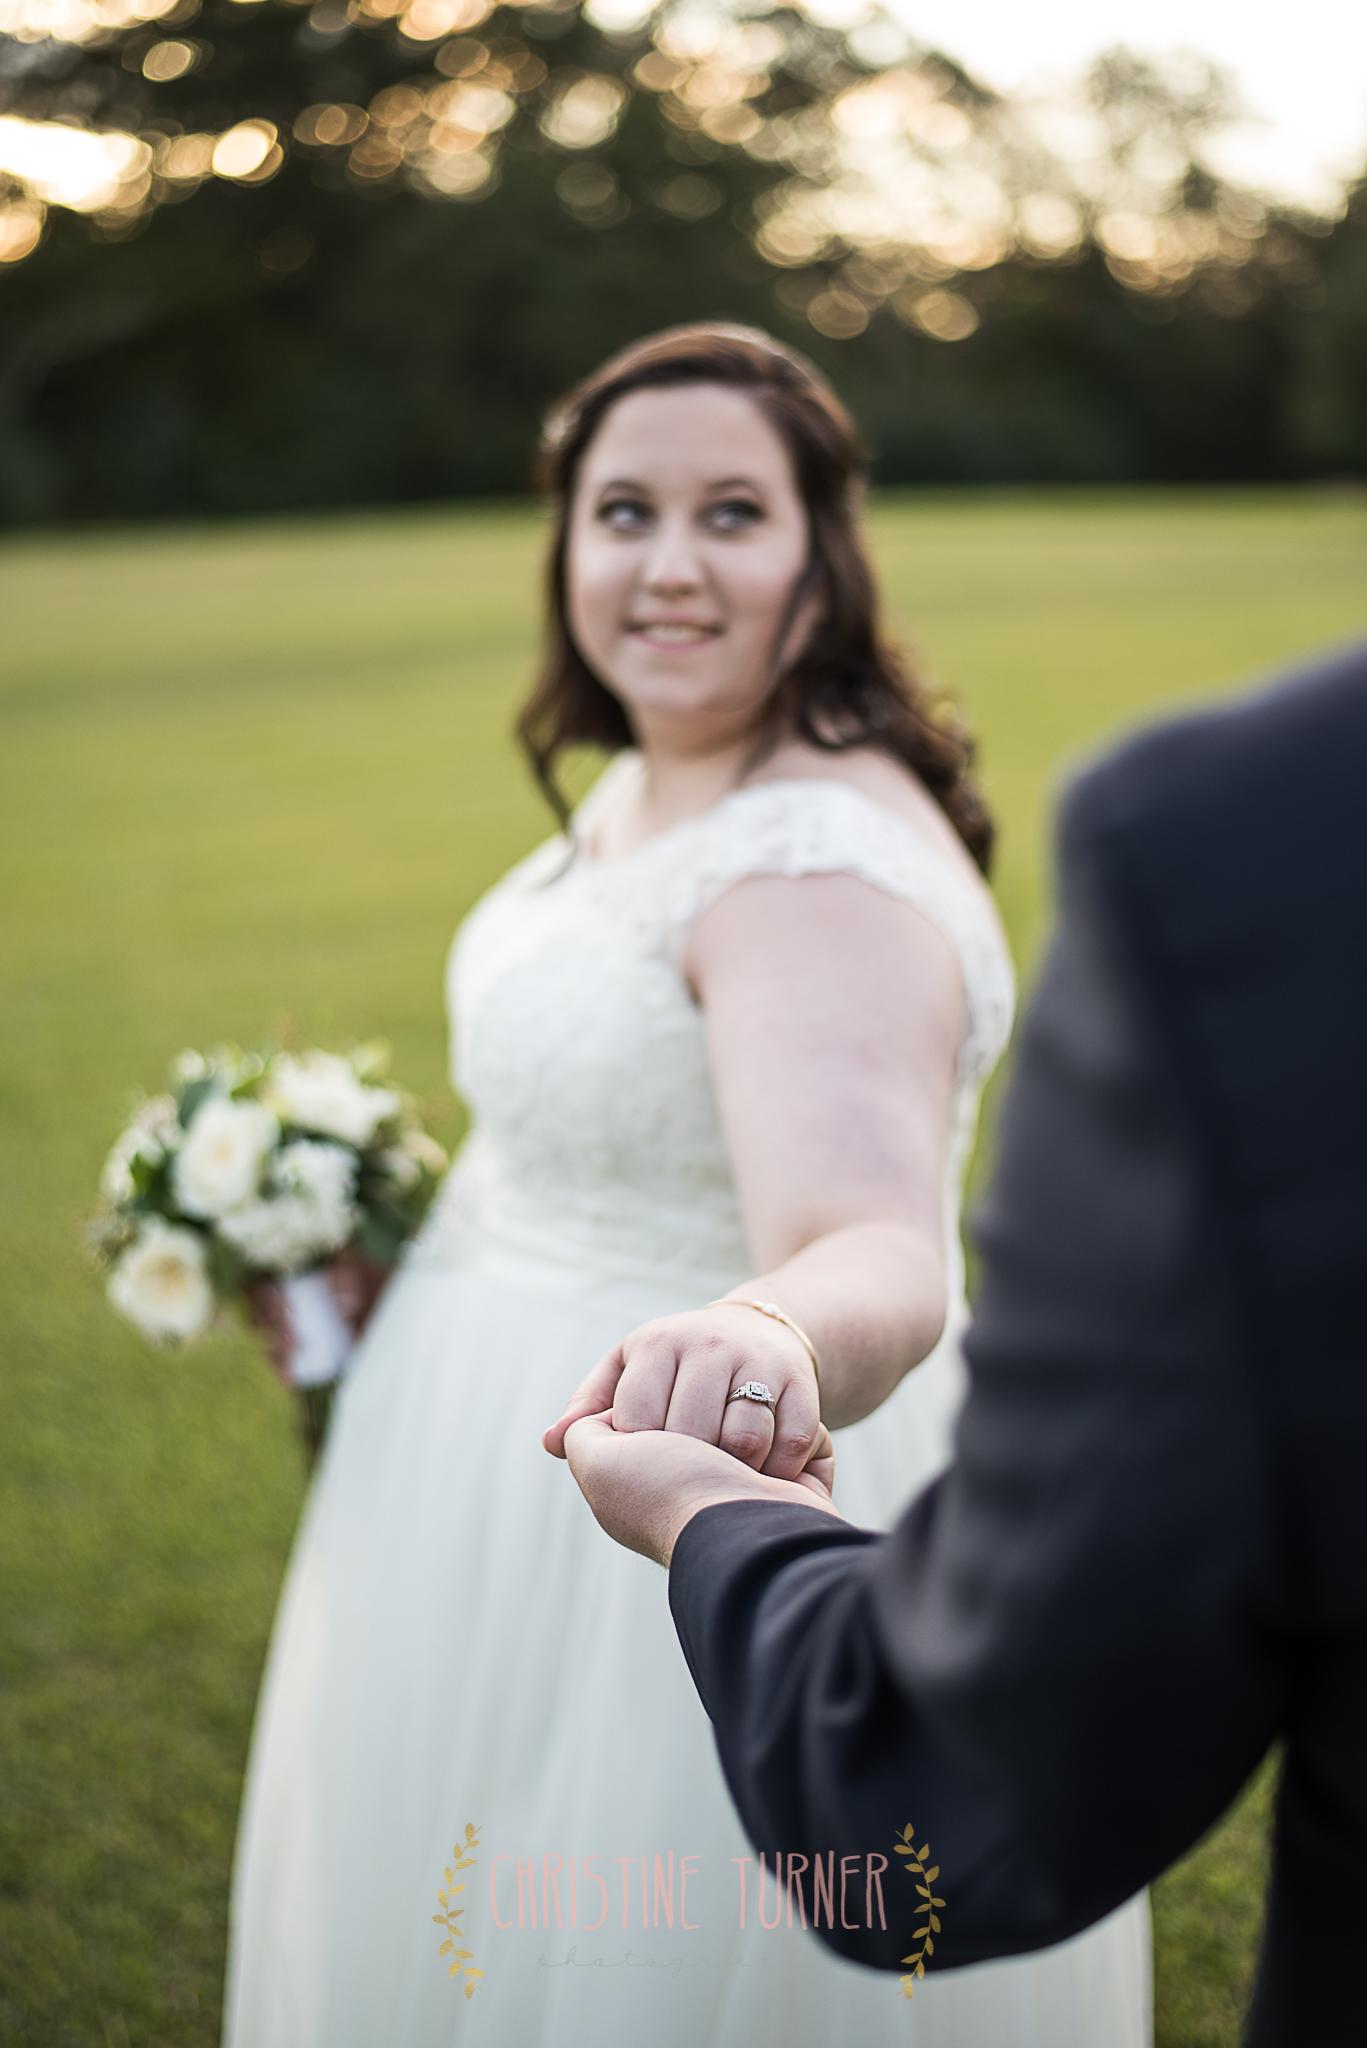 J&D Wedding (23 of 24)